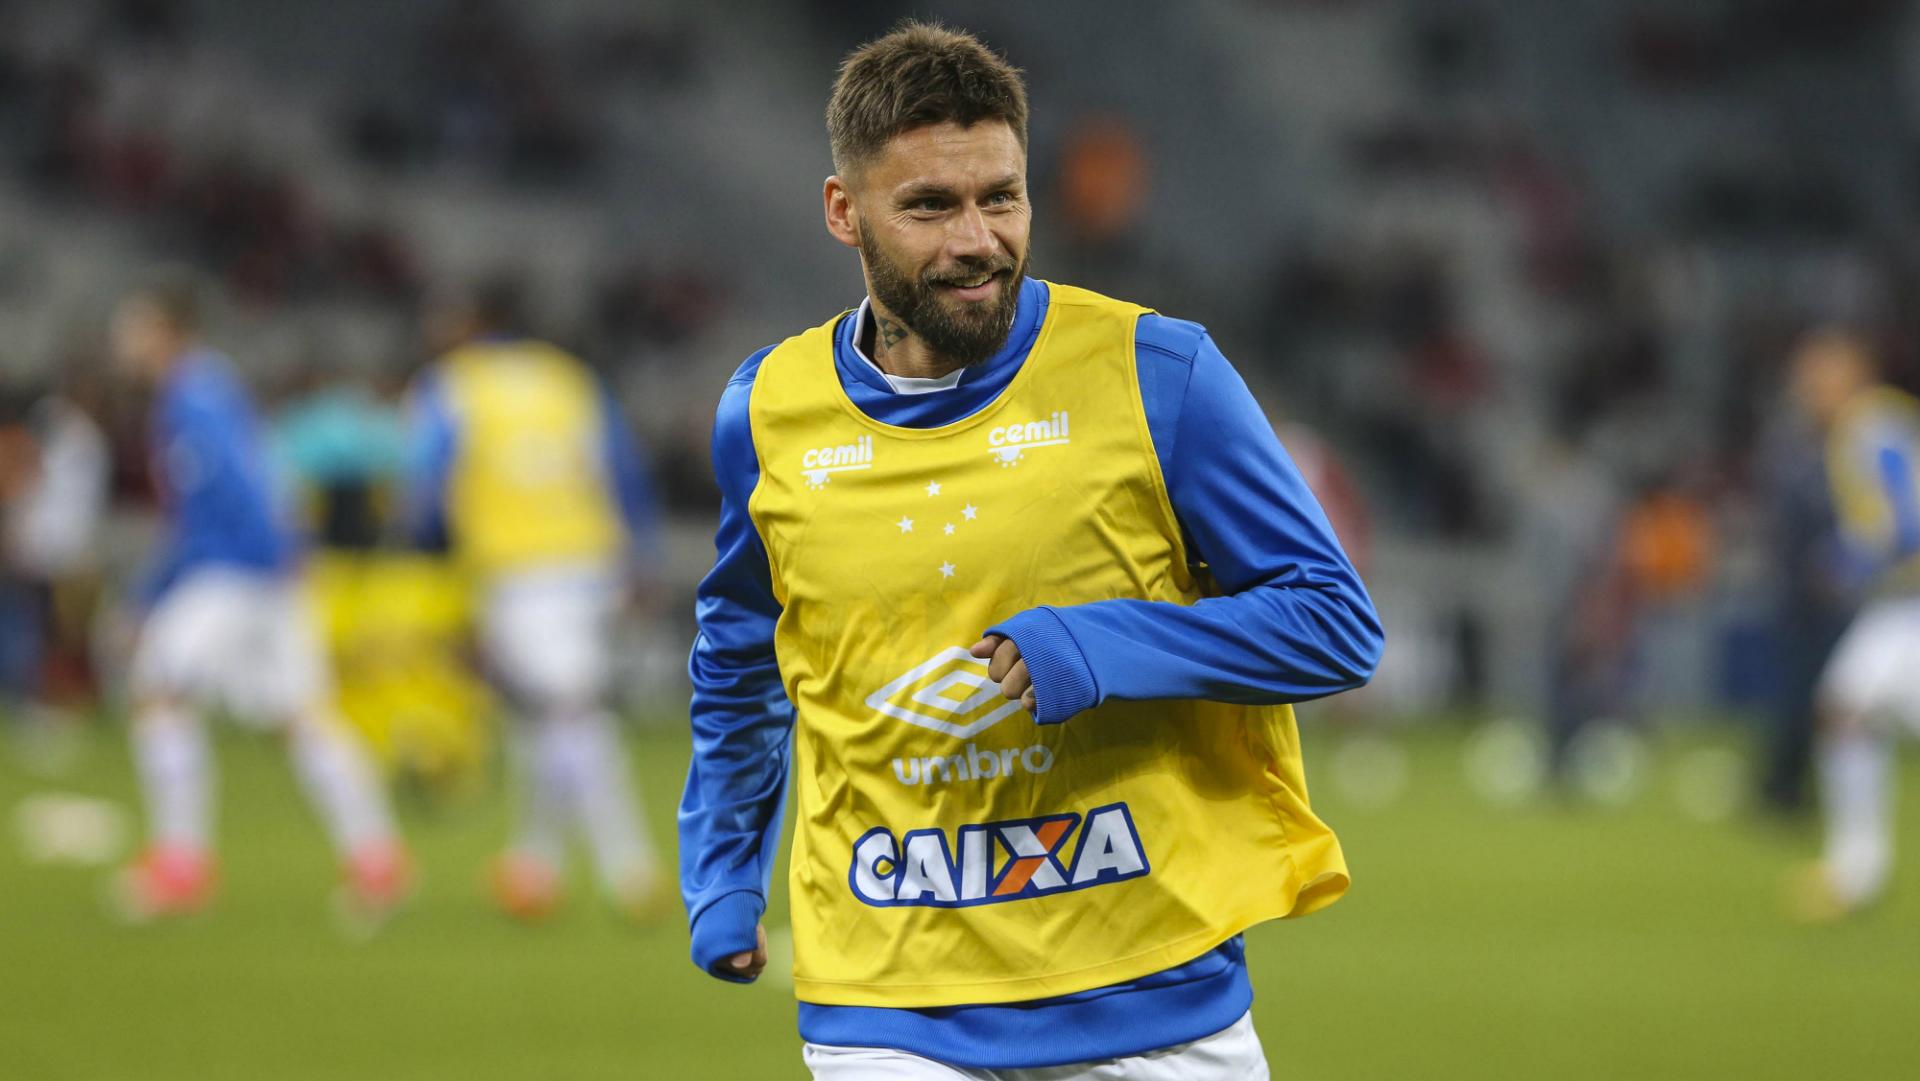 Rafael Sóbis Atlético-PR Cruzeiro Campeonato Brasileiro 12072017